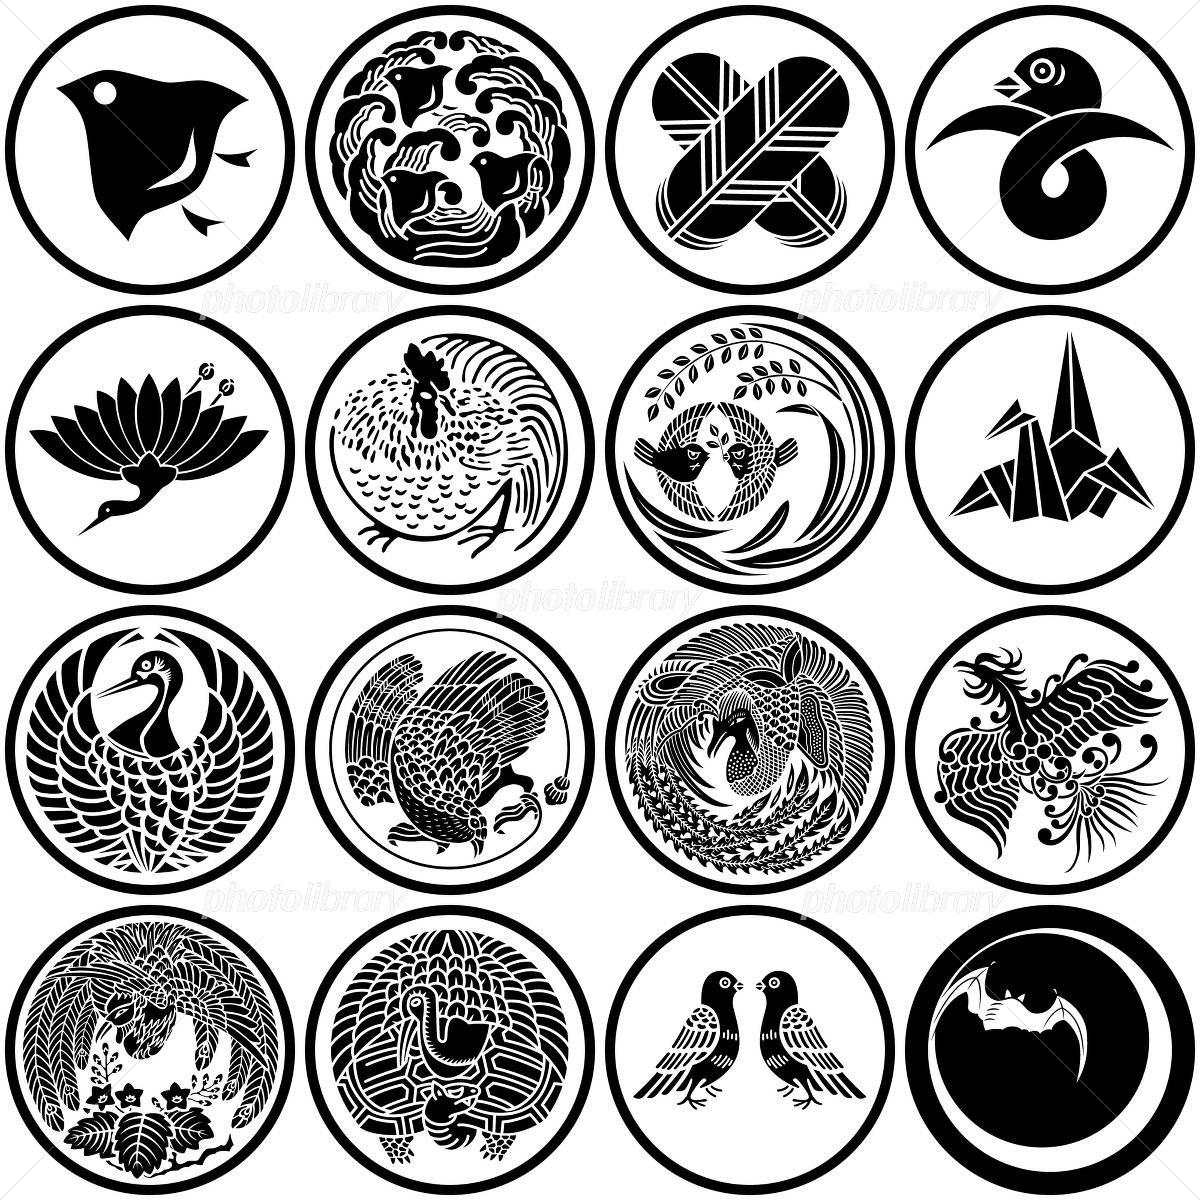 鳥 和風マーク 紋章 家紋 家紋 紋章 和 デザイン